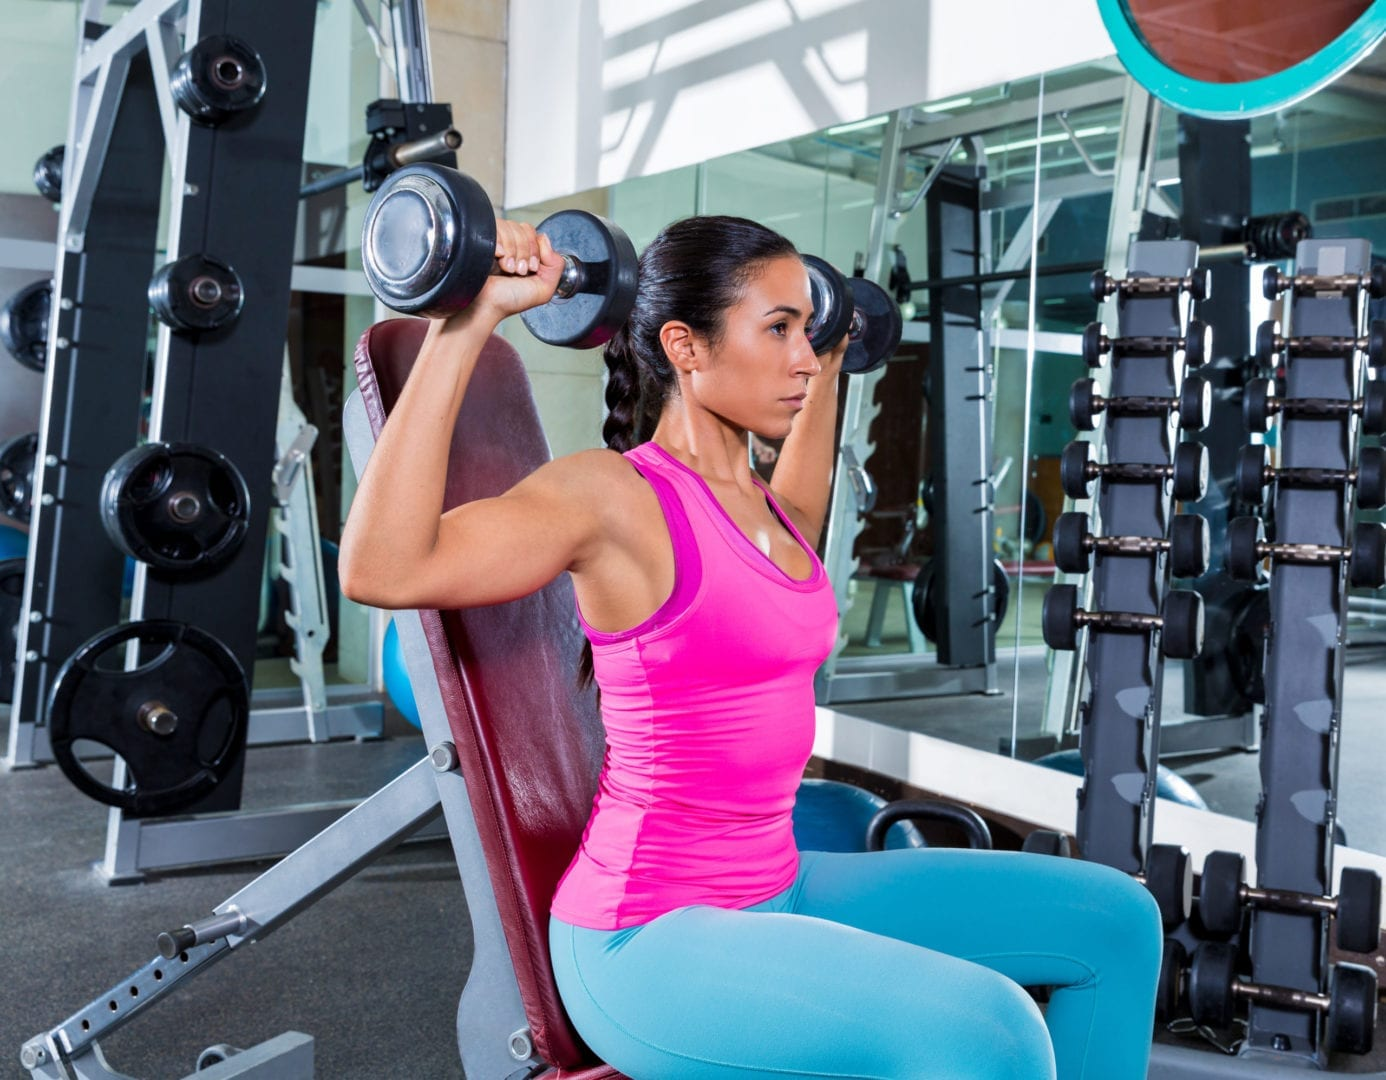 ketogenic bible workouts shoulder exercises overhead press